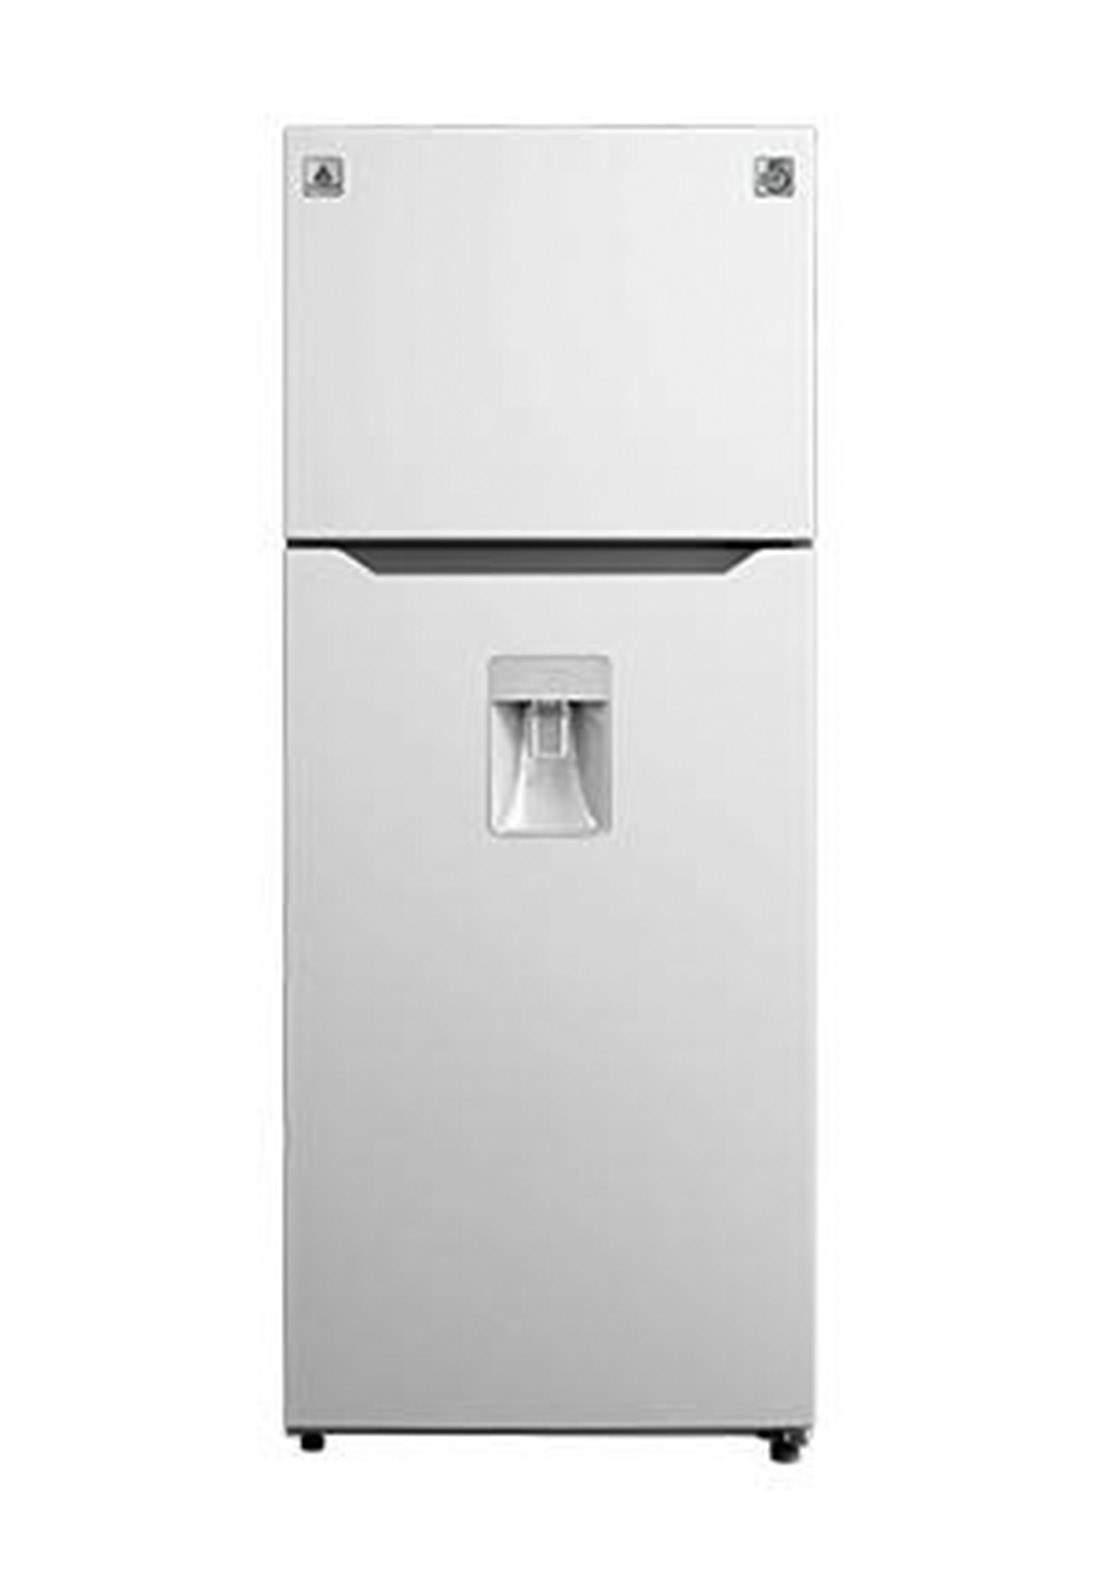 Alhafidh (RFHA-TM650DCW) 22cf Direct Cool Top Mount Refrigerator ثلاجة بابين